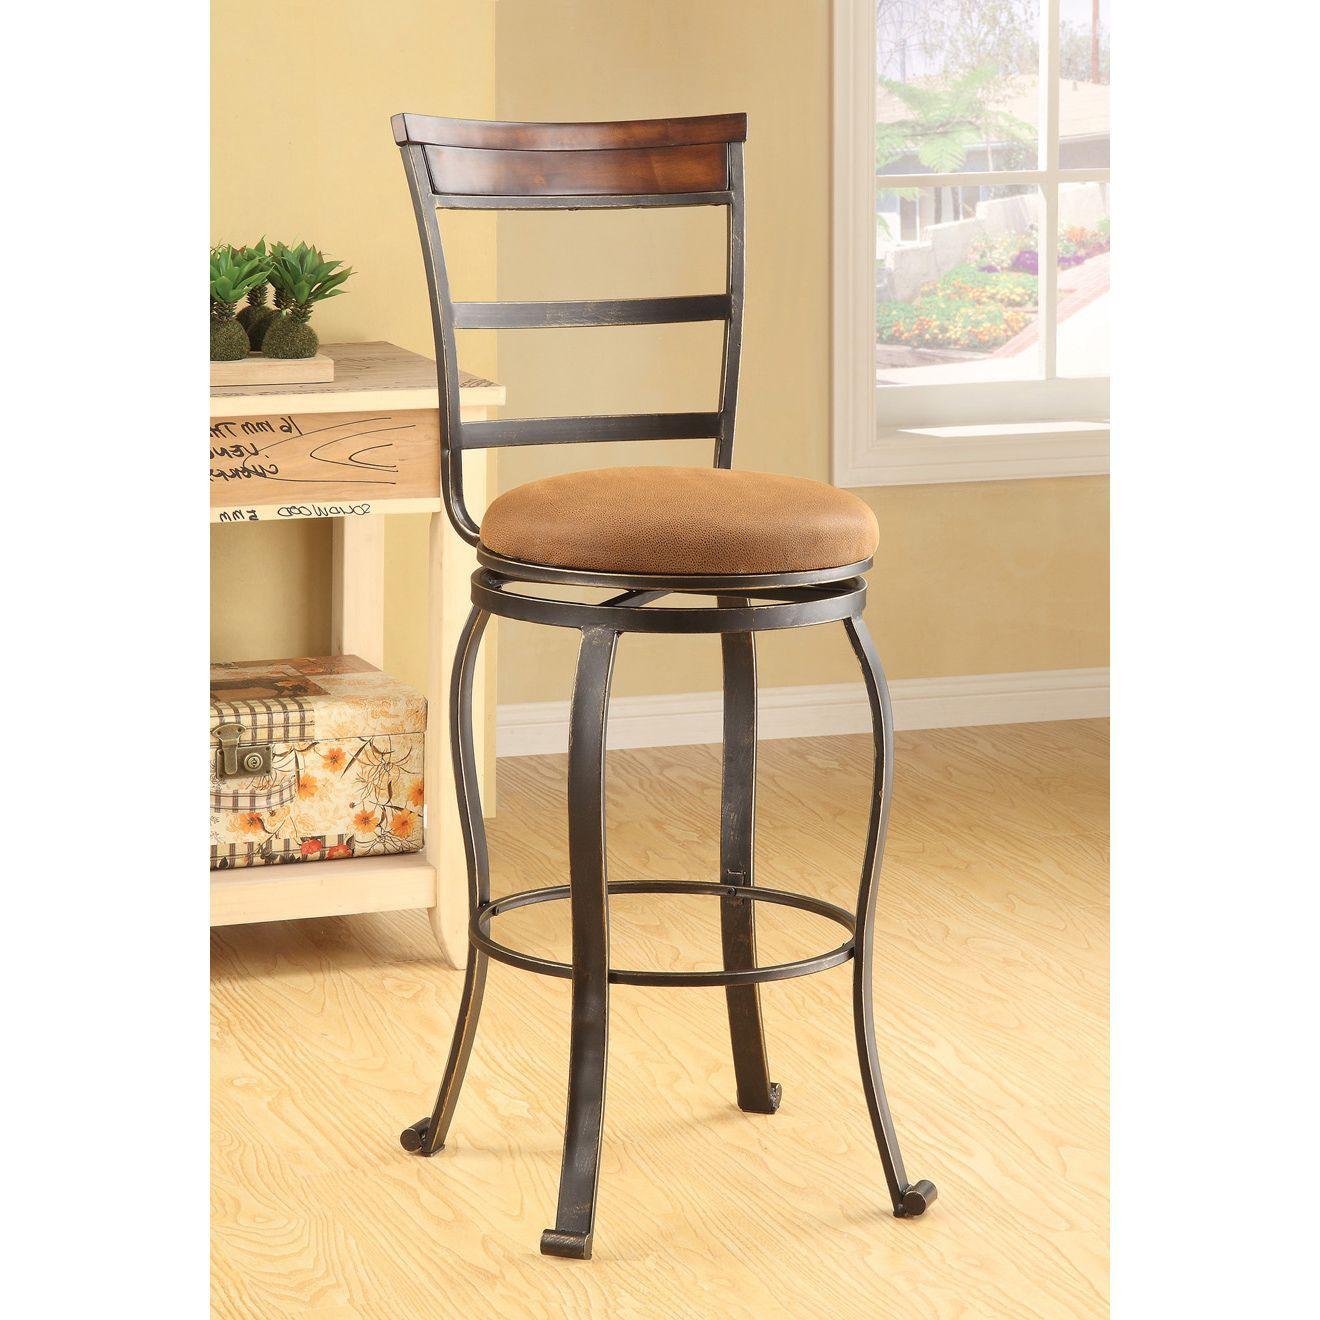 Swivel beige bar chair set of kd bar stool brown metal